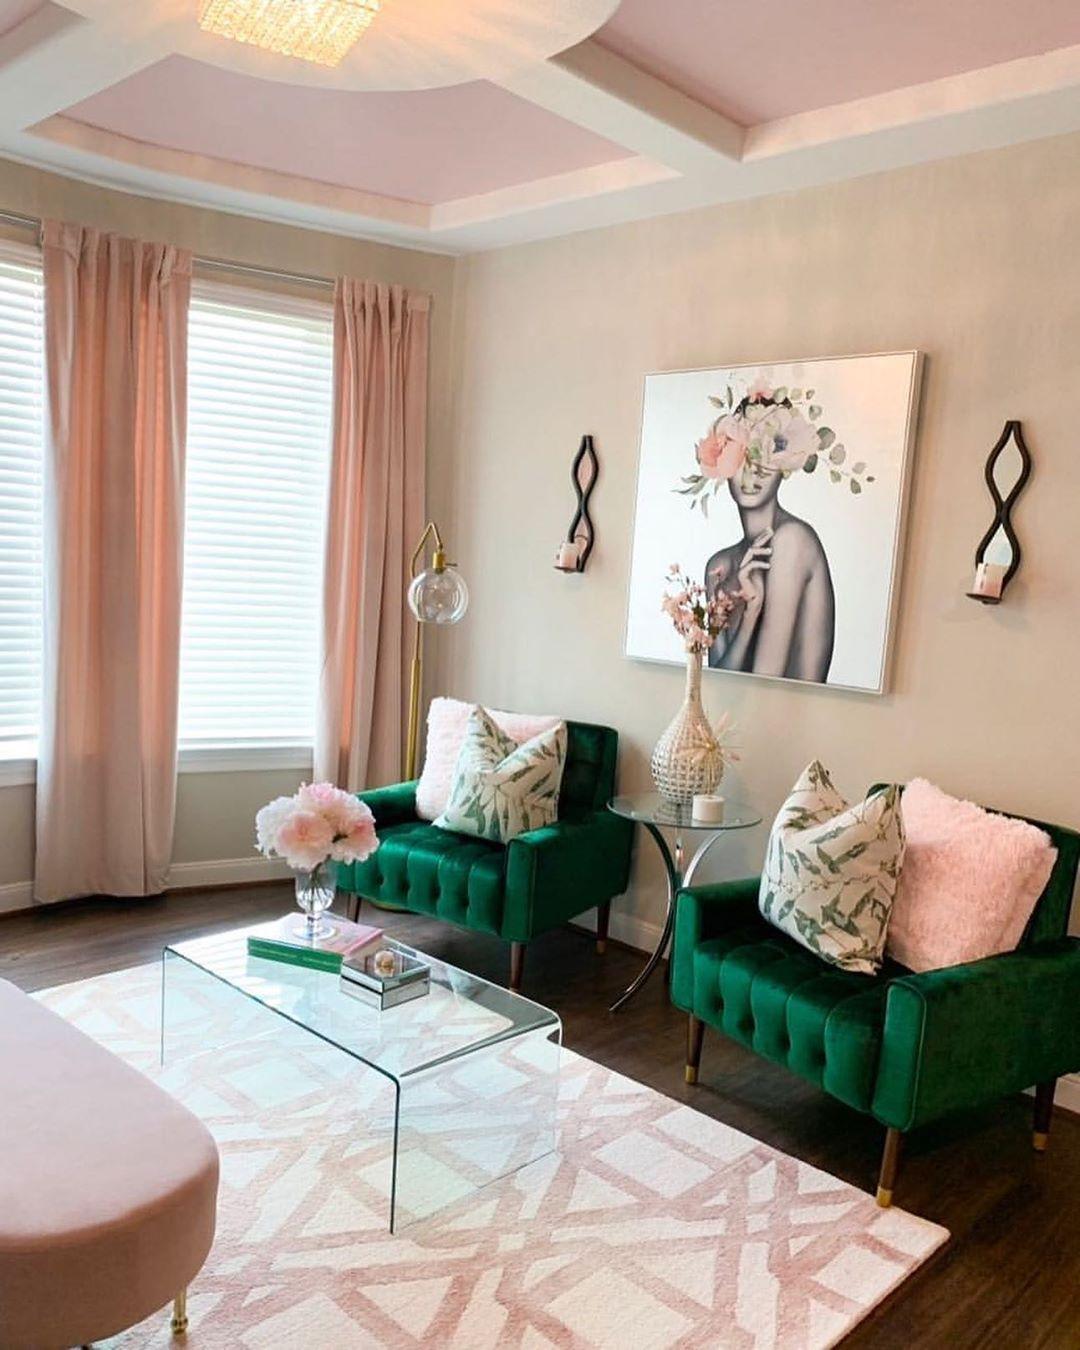 Pin By Maci Ardoin On Spa Art In 2020 Living Room Decor Apartment Pink Living Room Living Room Green